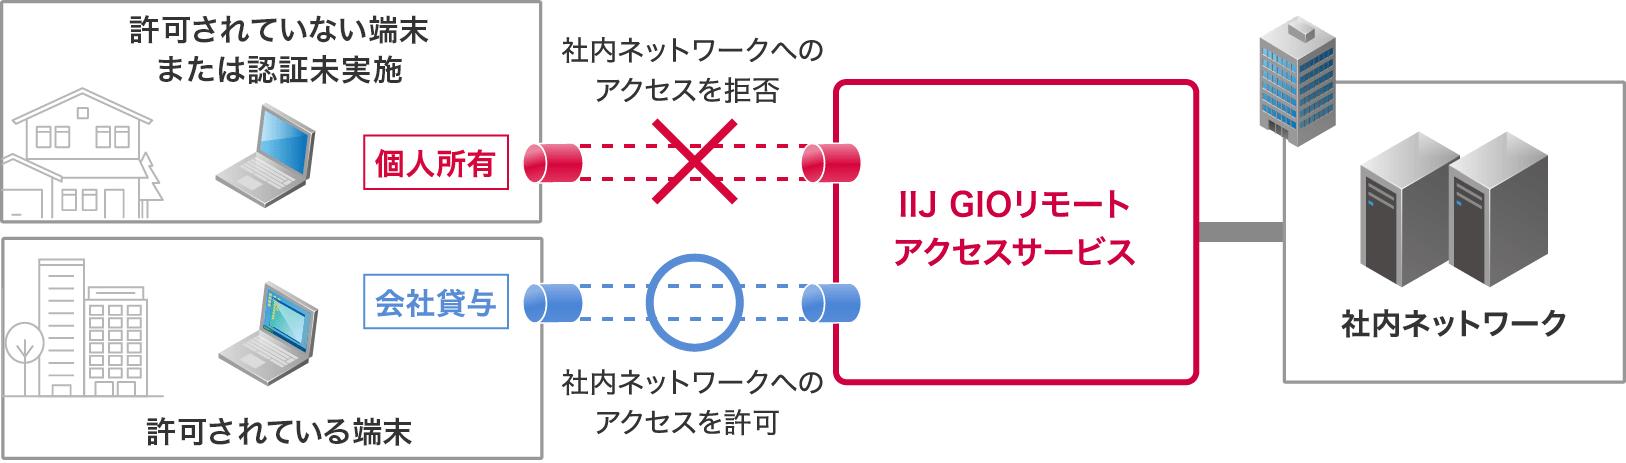 MACアドレスの登録/編集